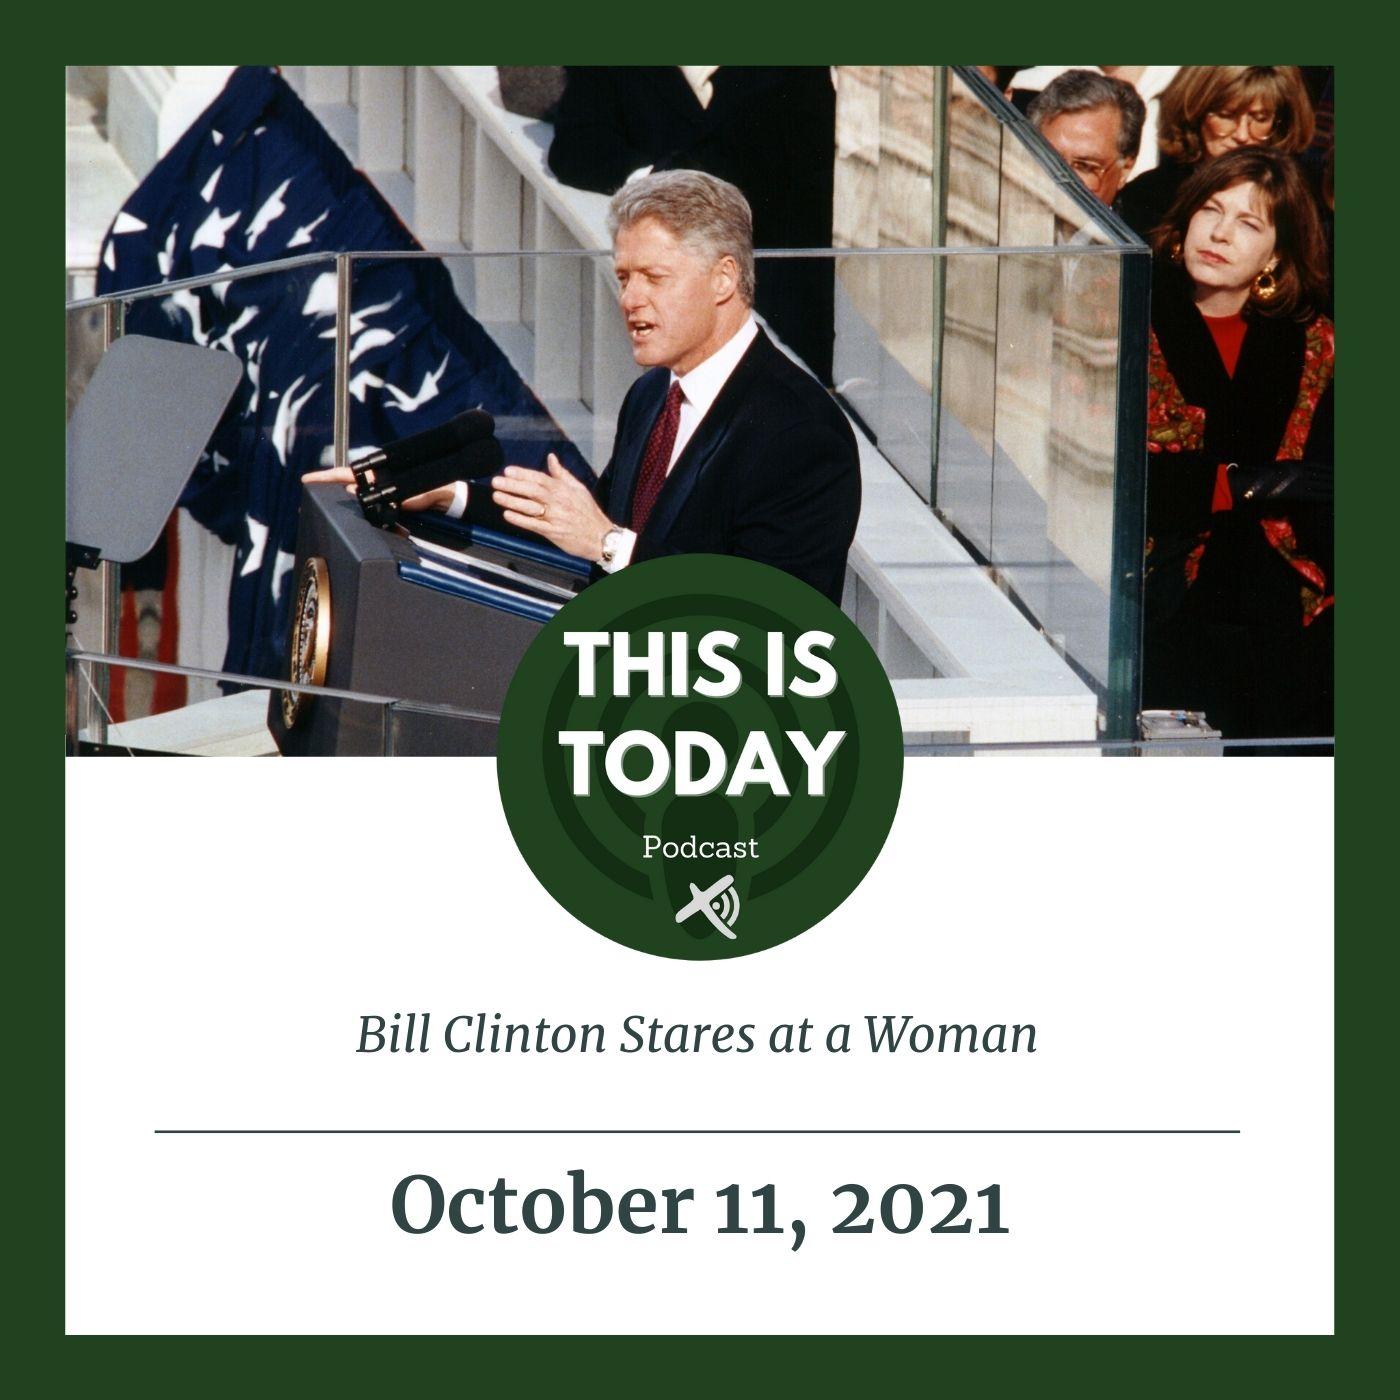 Bill Clinton Stares at a Woman